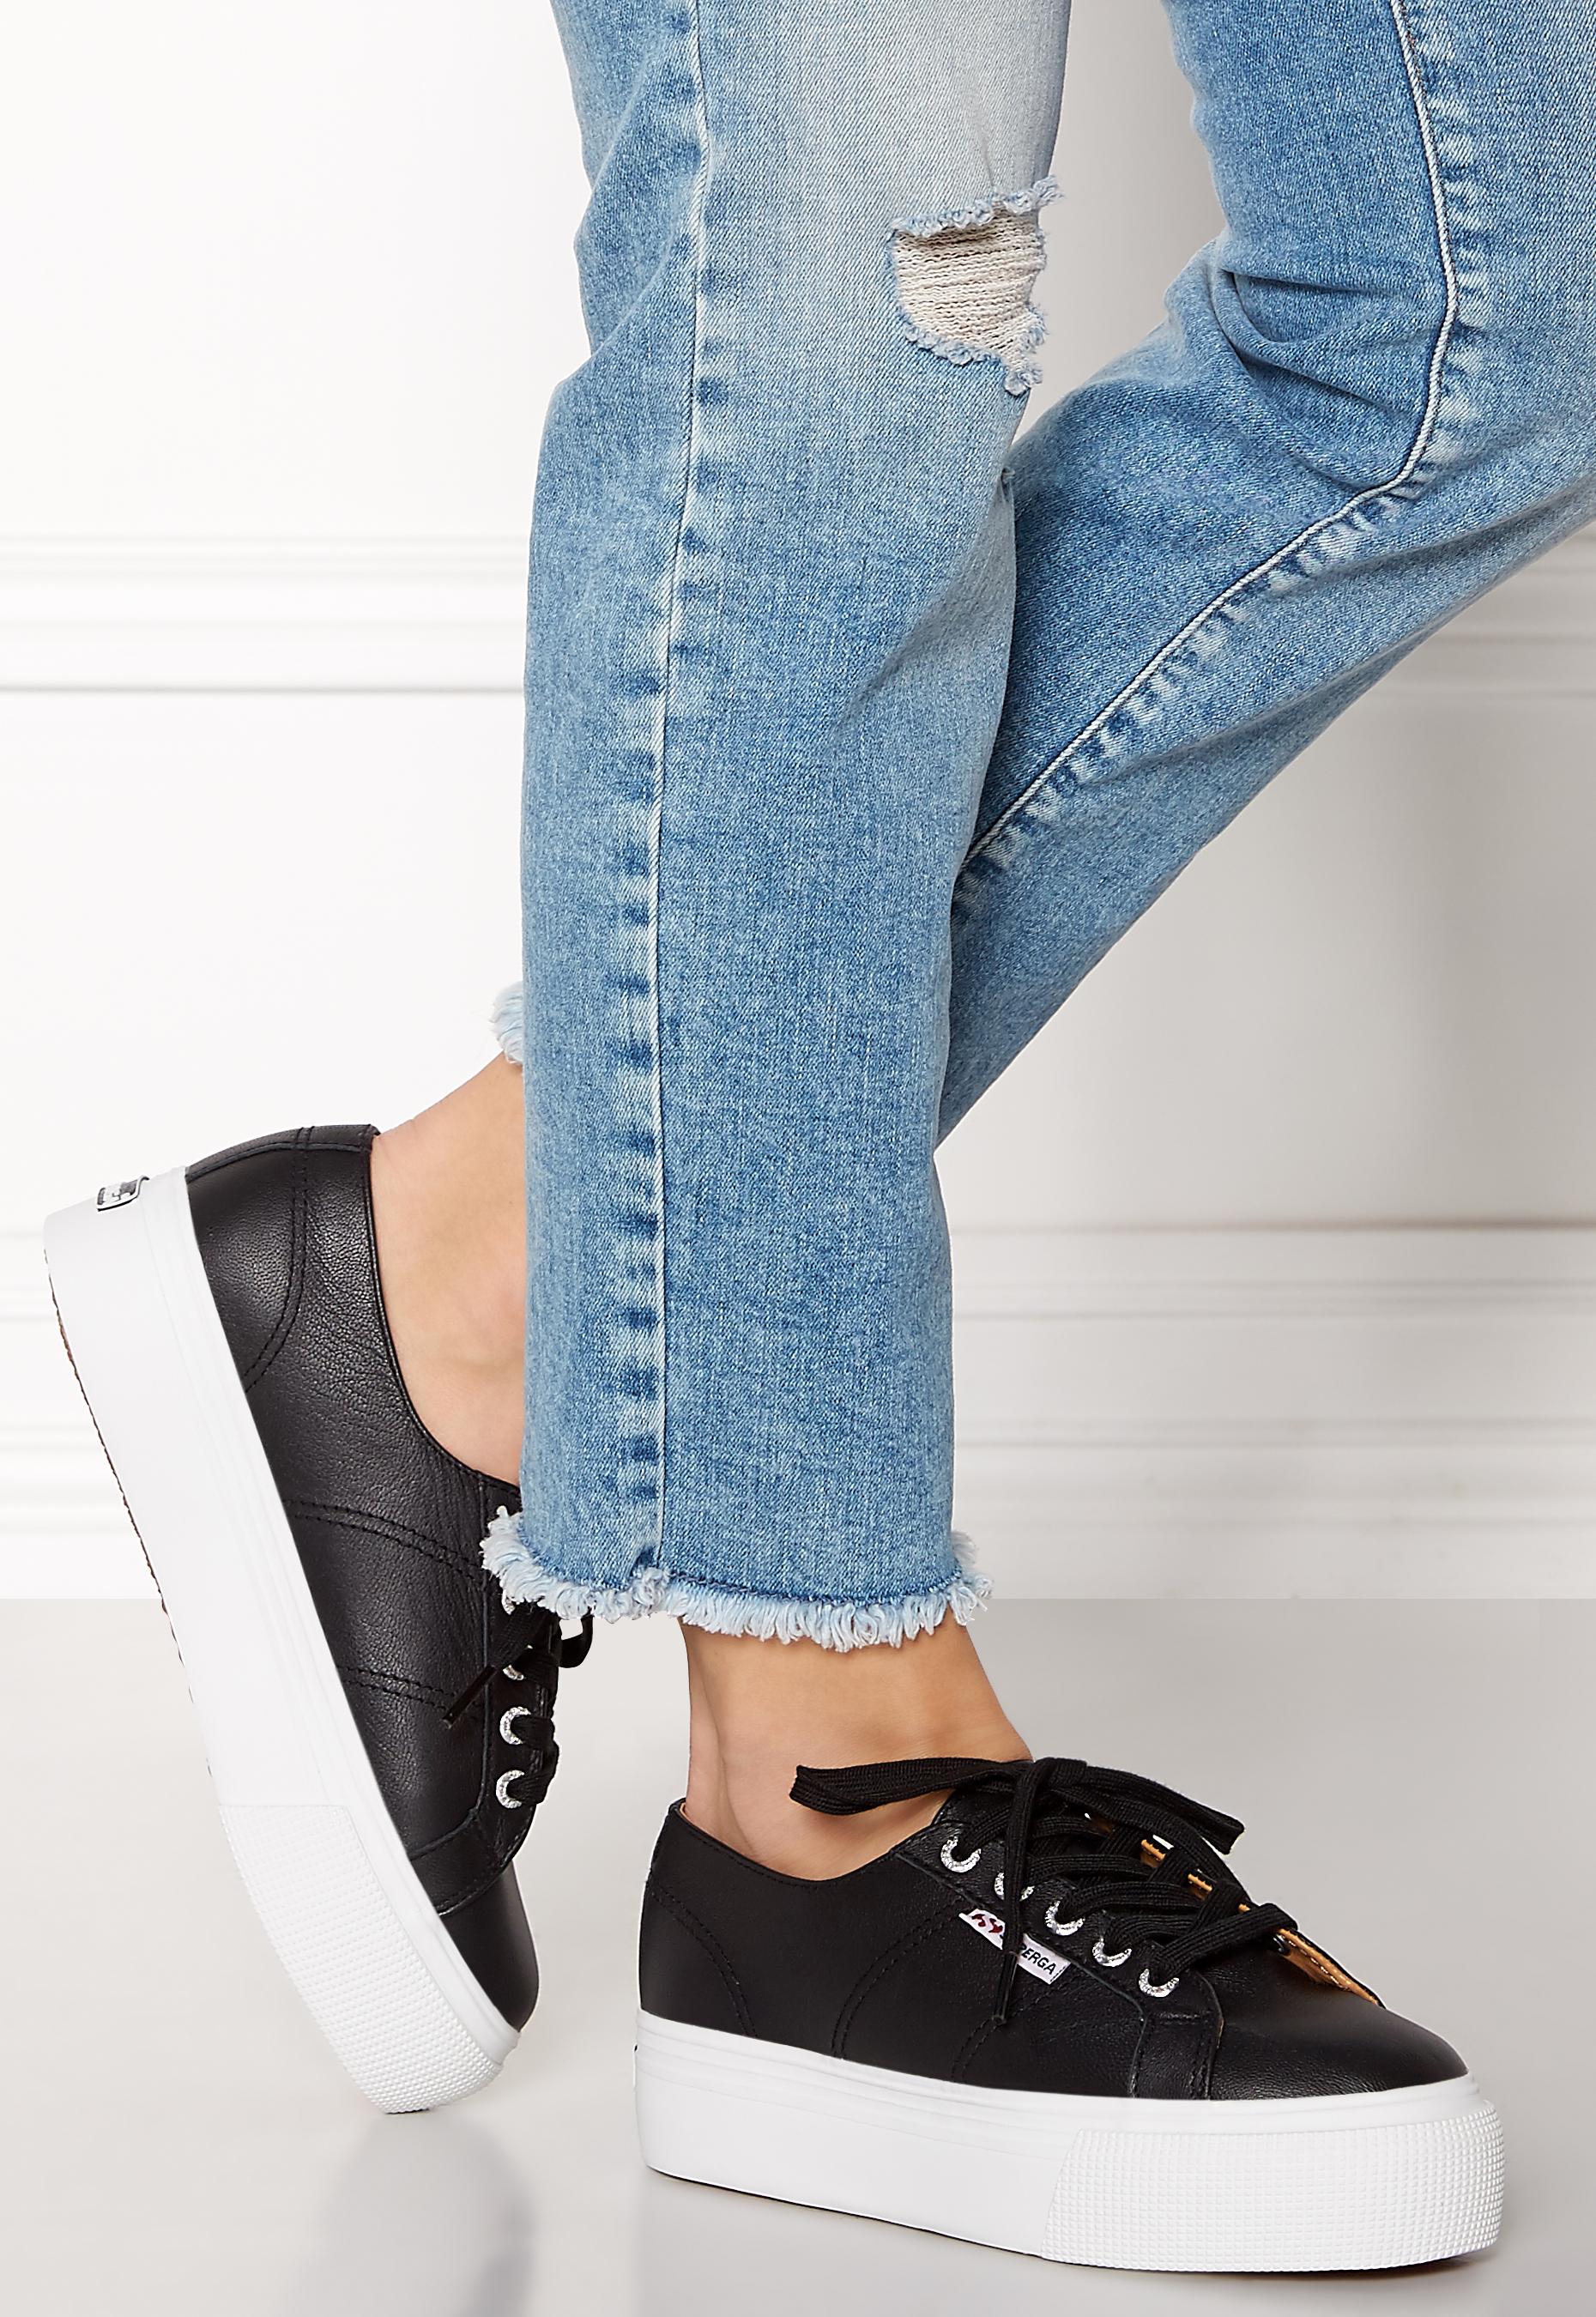 Superga Nappalea Sneakers Black-White